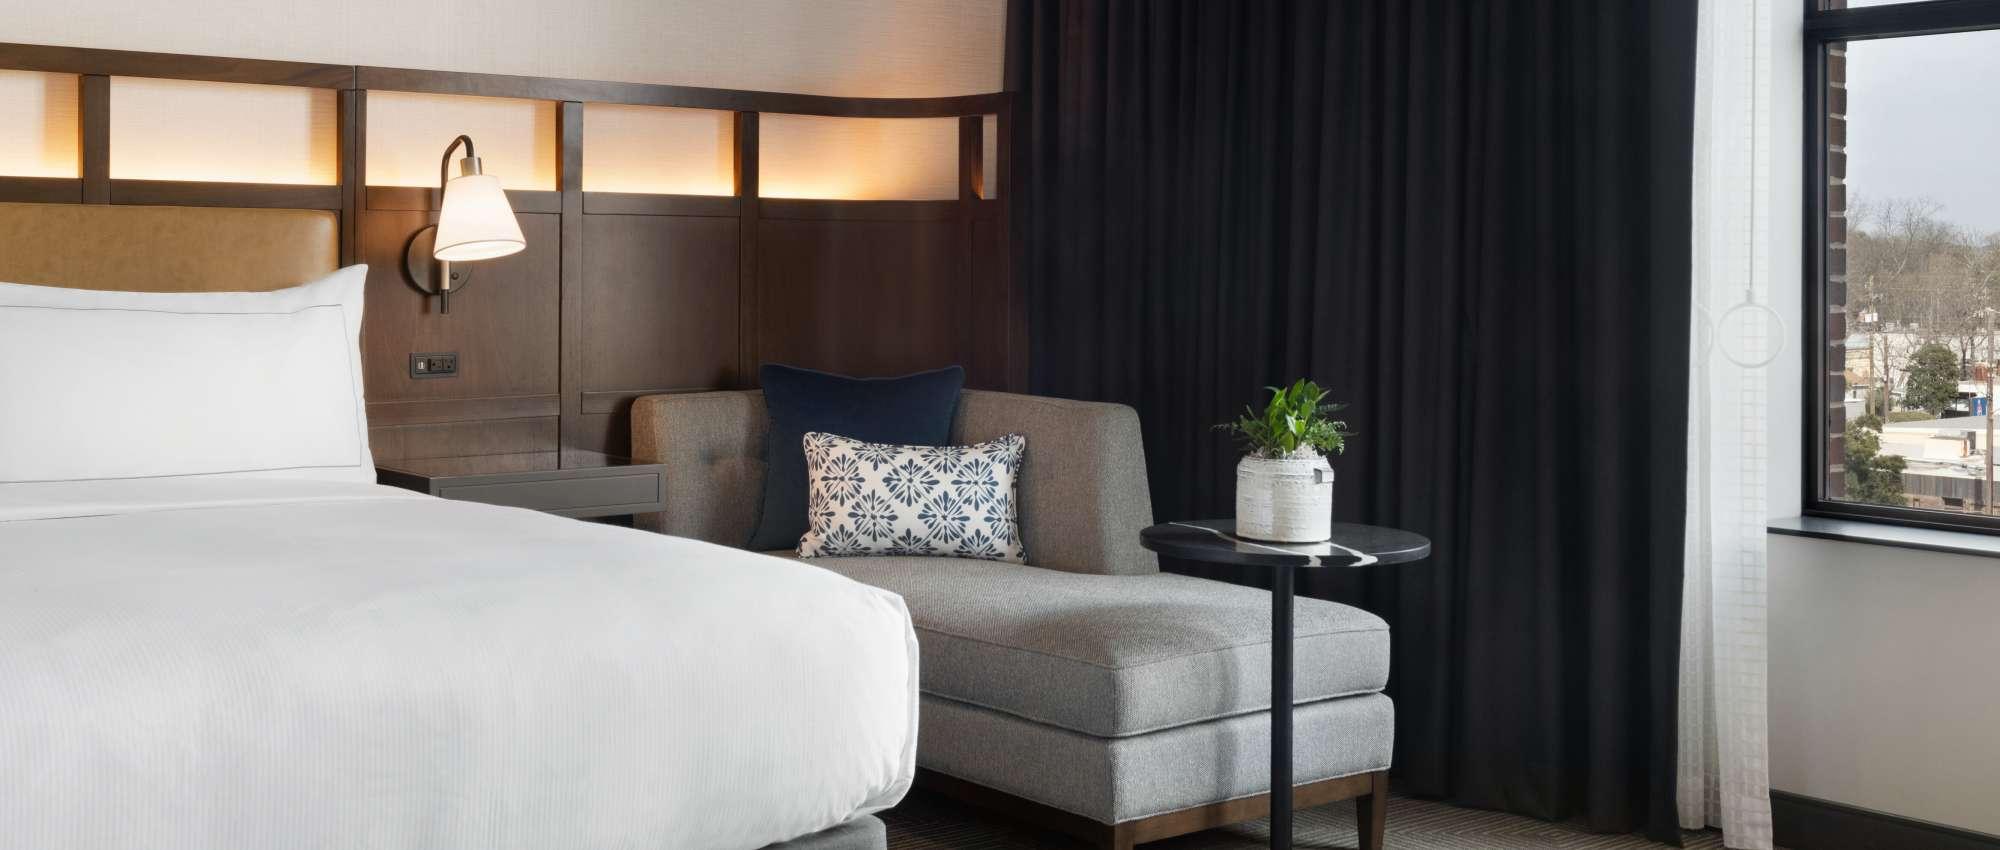 Valley Hotel Homewood Birmingham, Curio Collection By Hilton